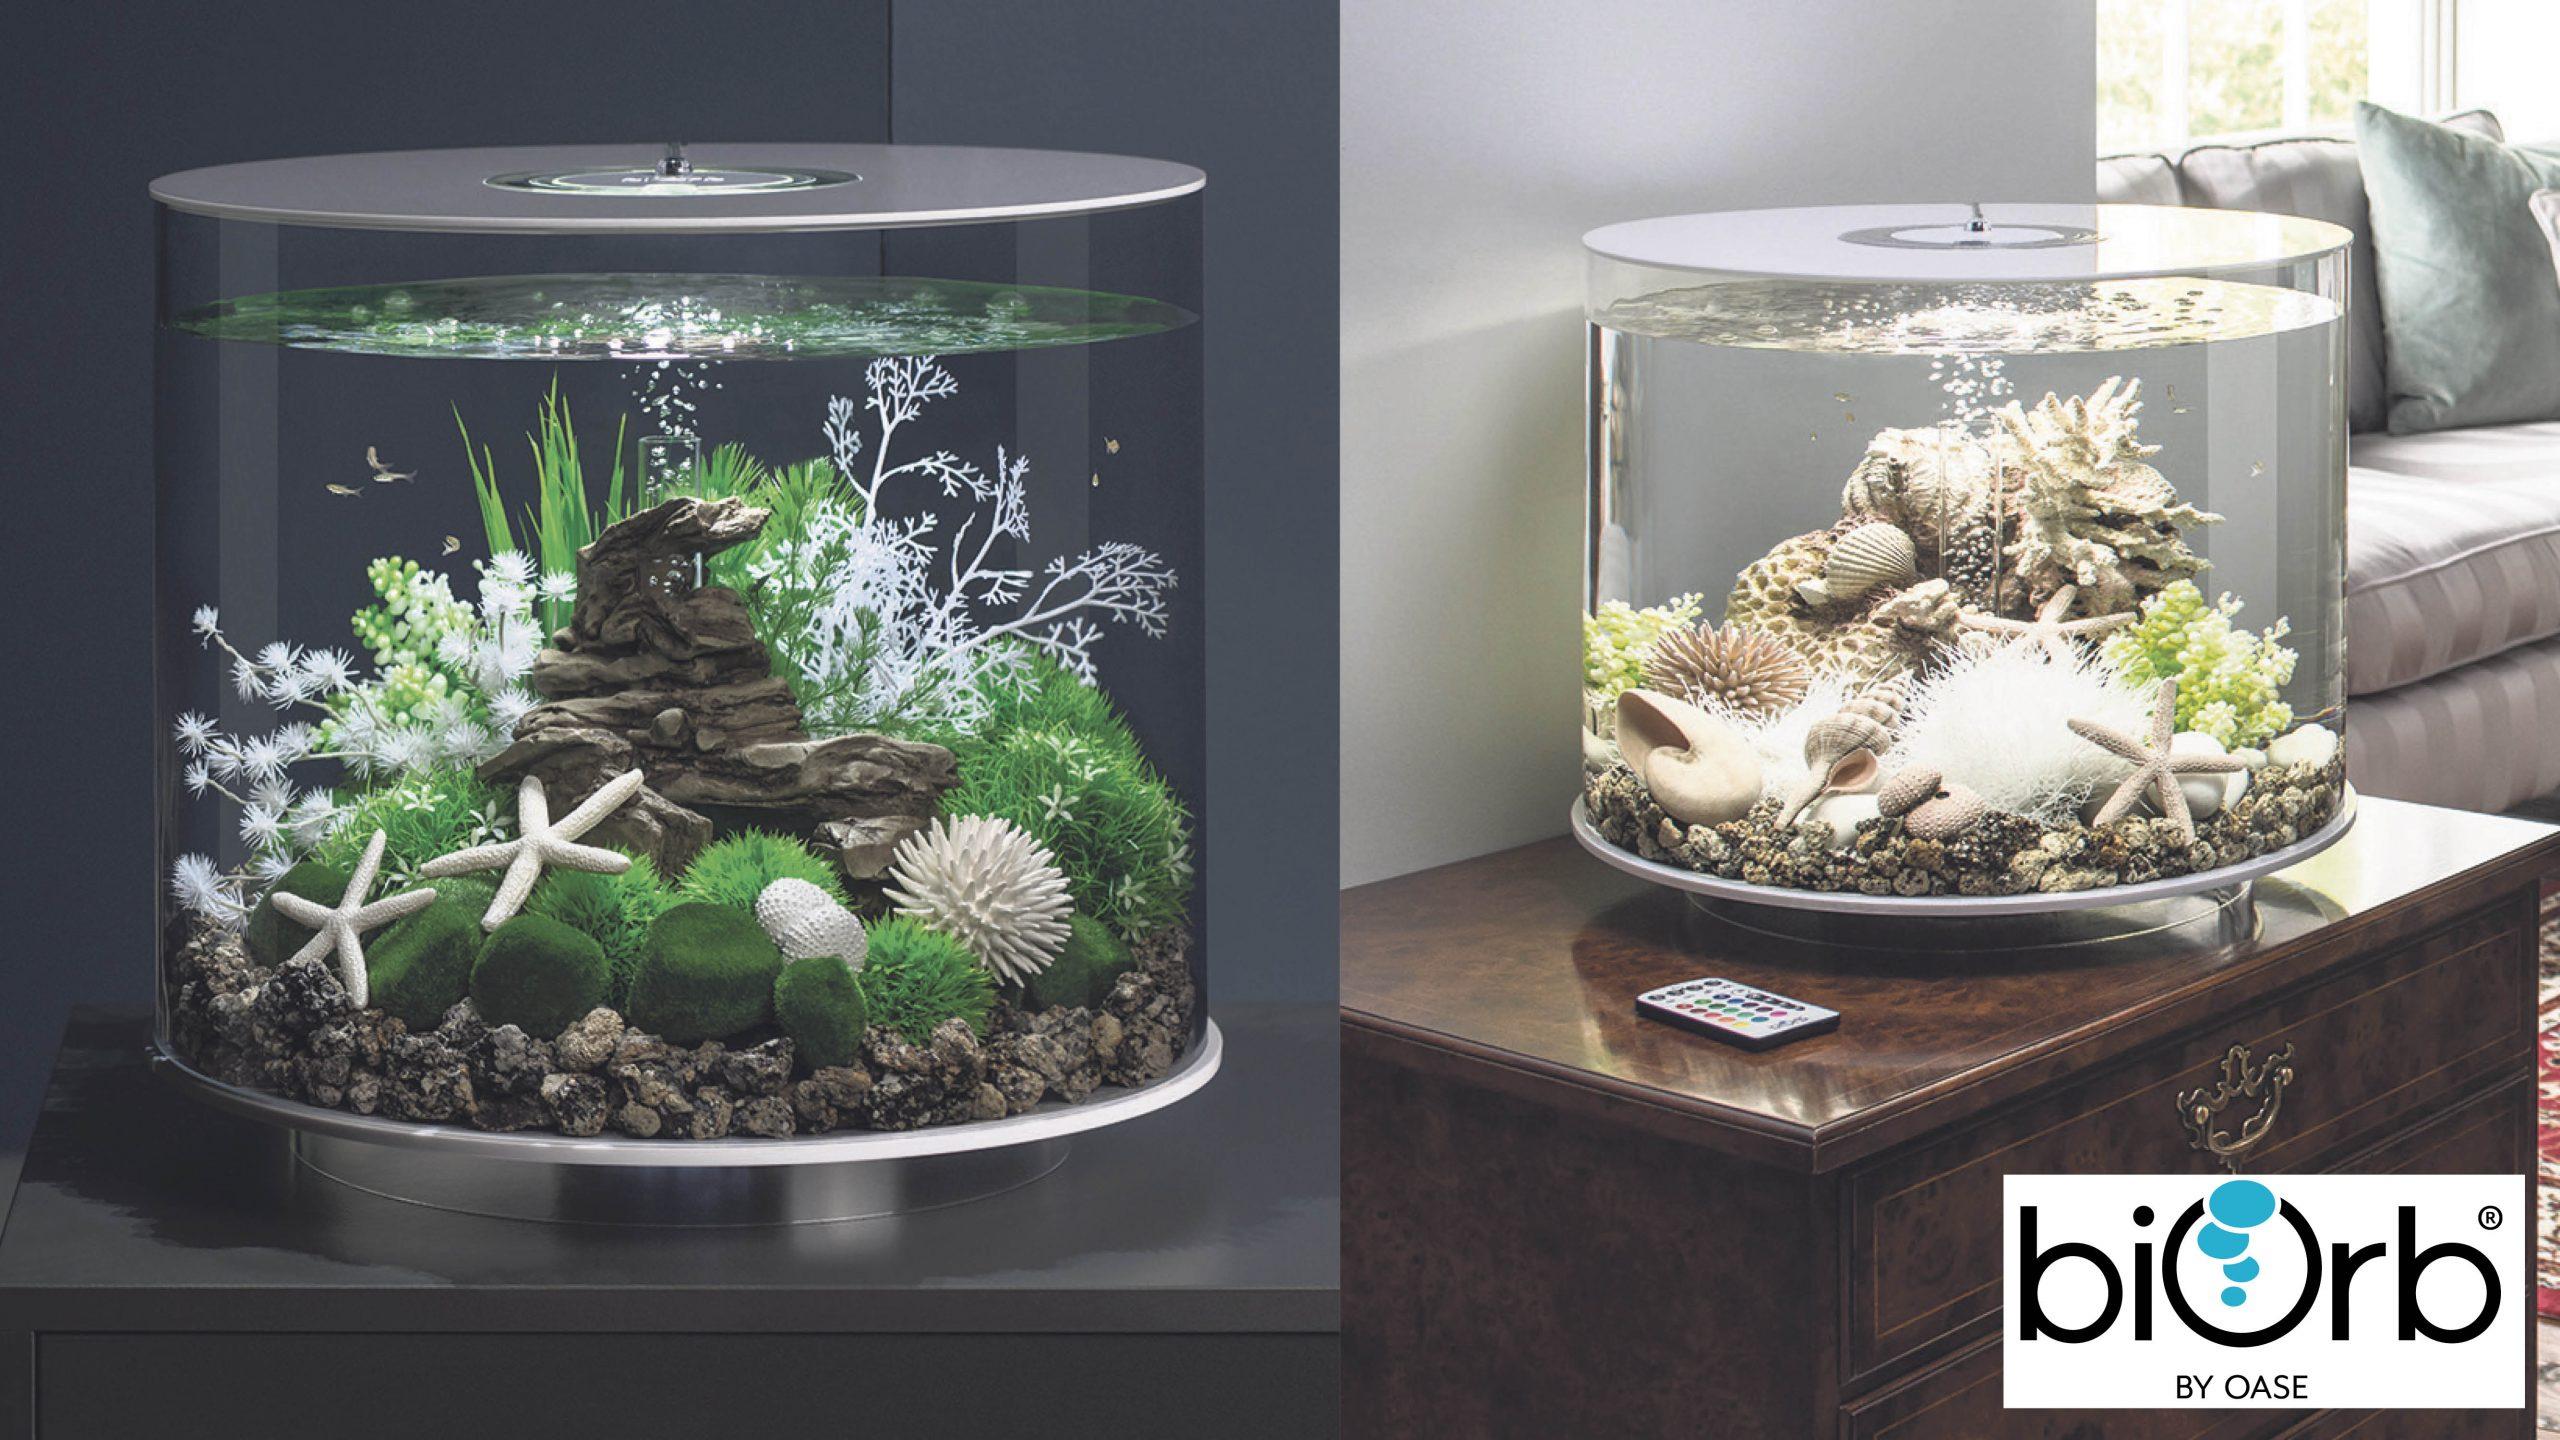 Win a stunning home aquarium Worth £200!